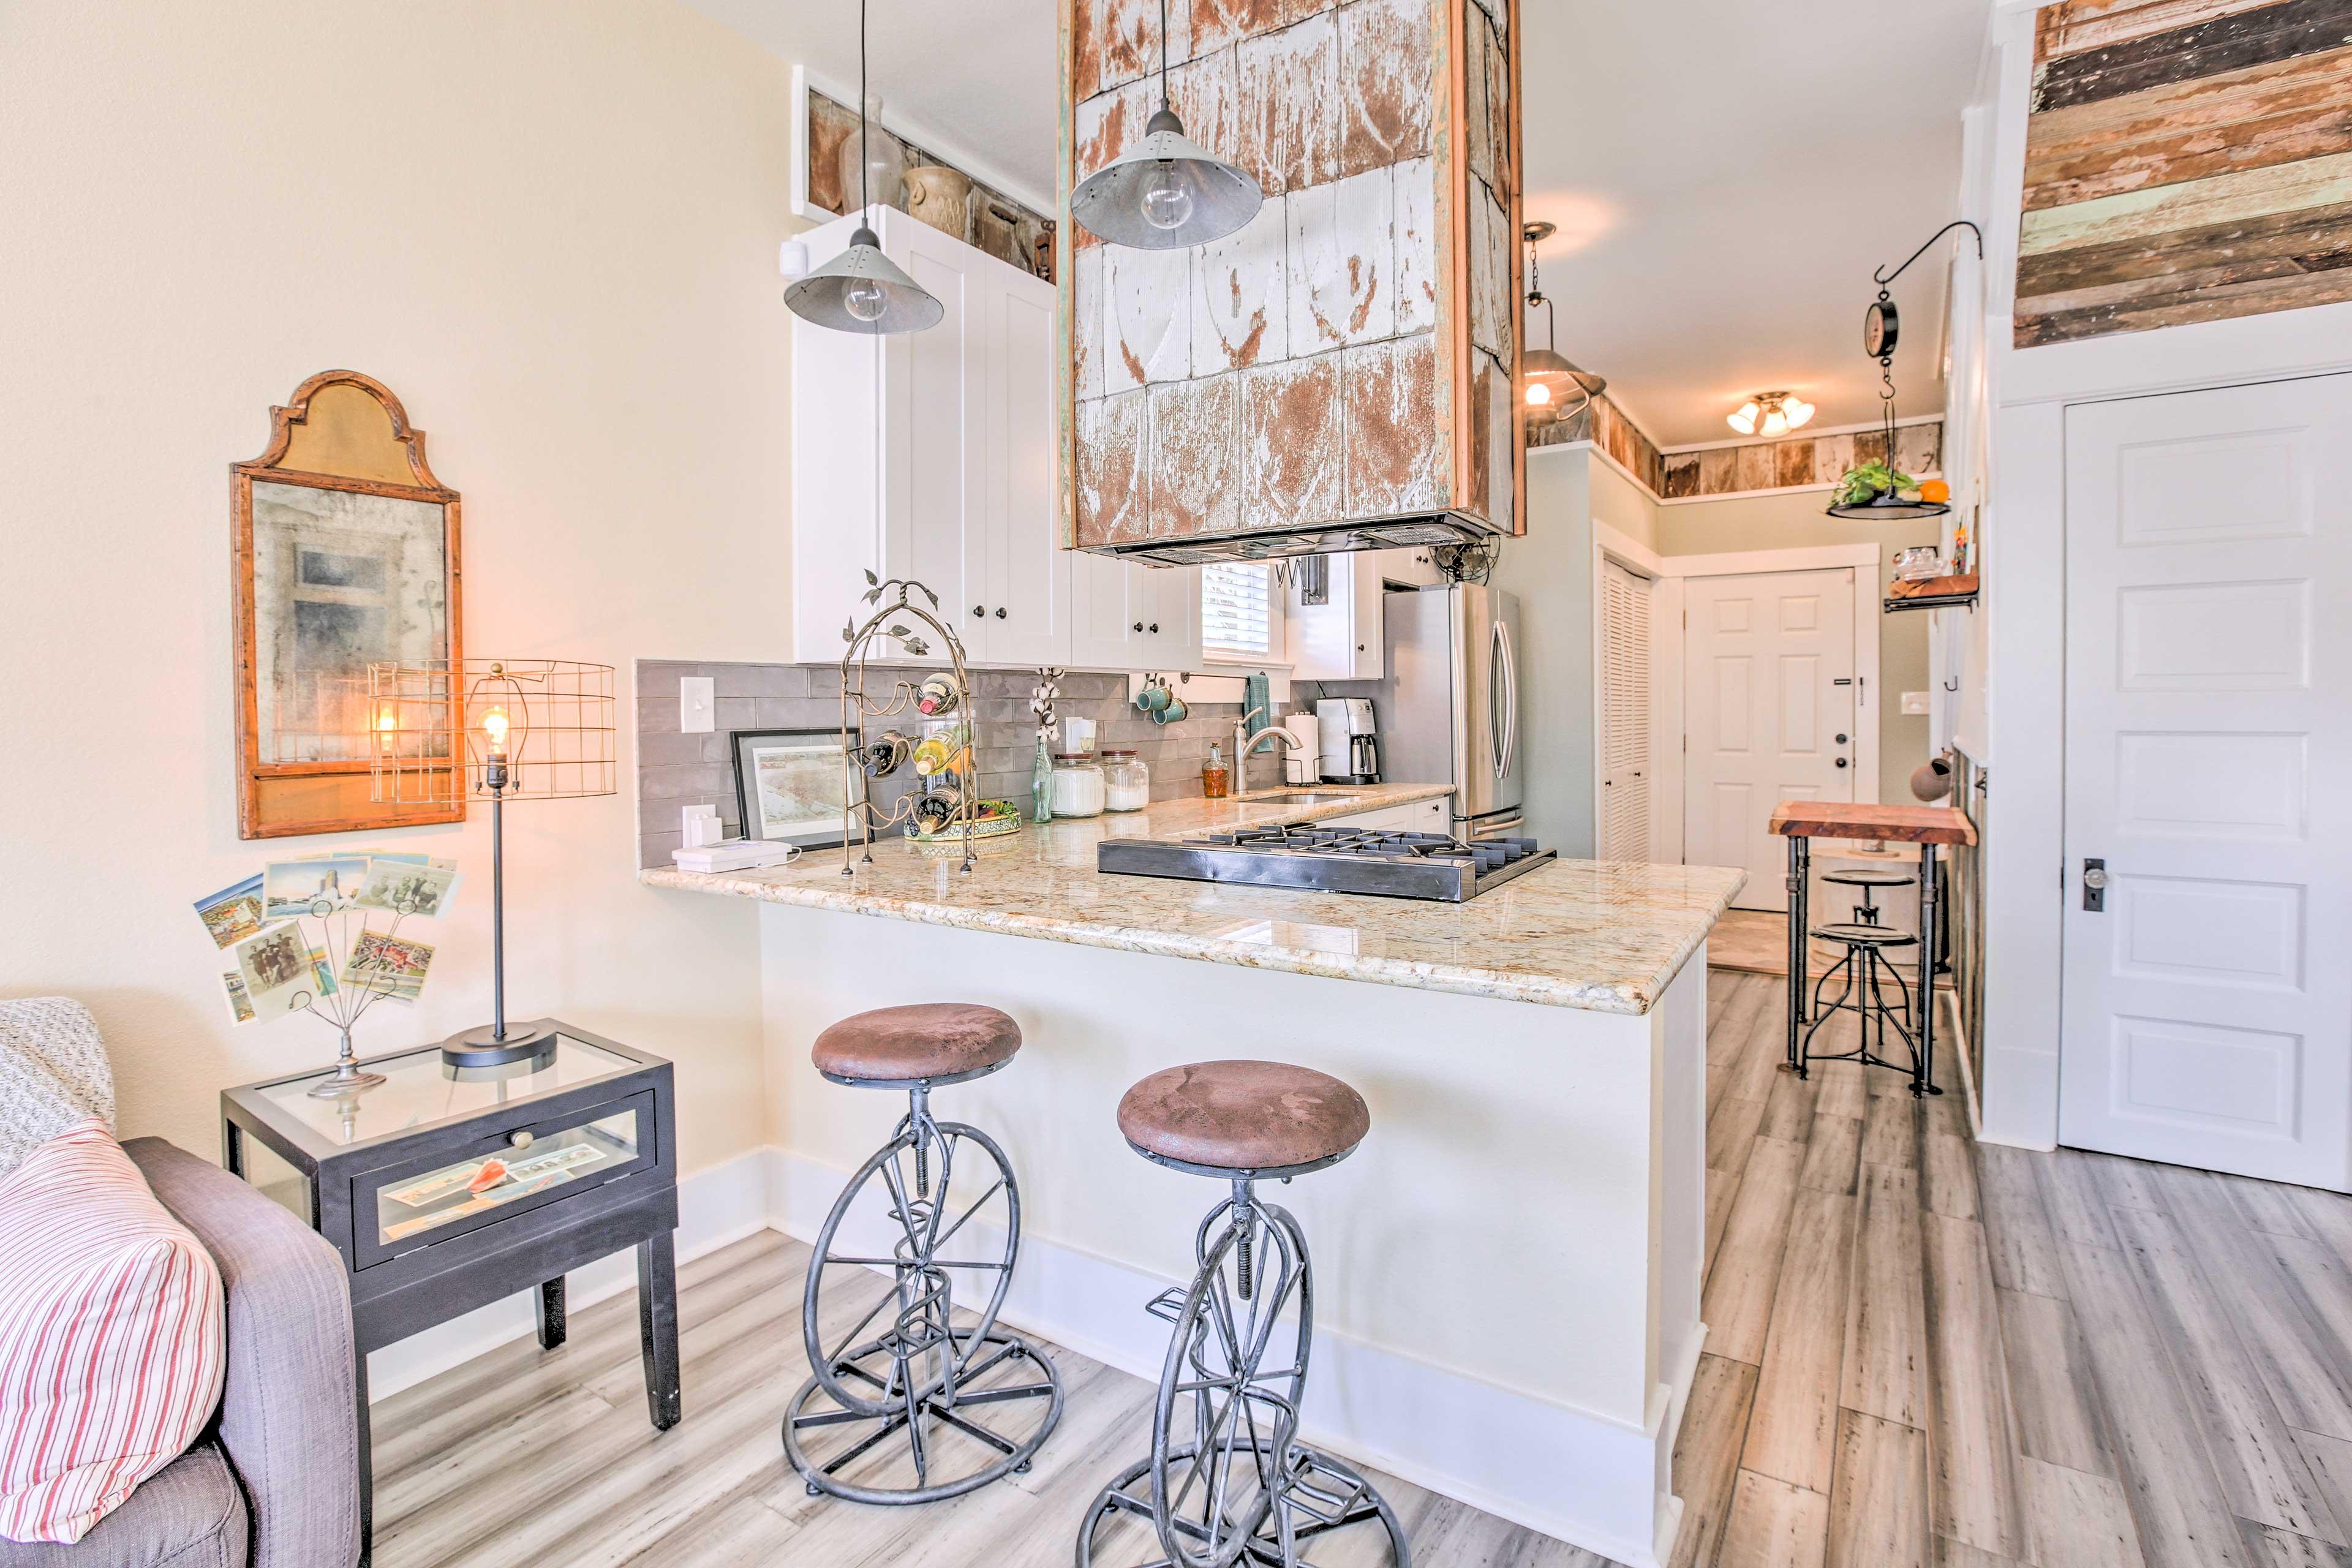 This unique, farm-style kitchen is truly a chef's dream.